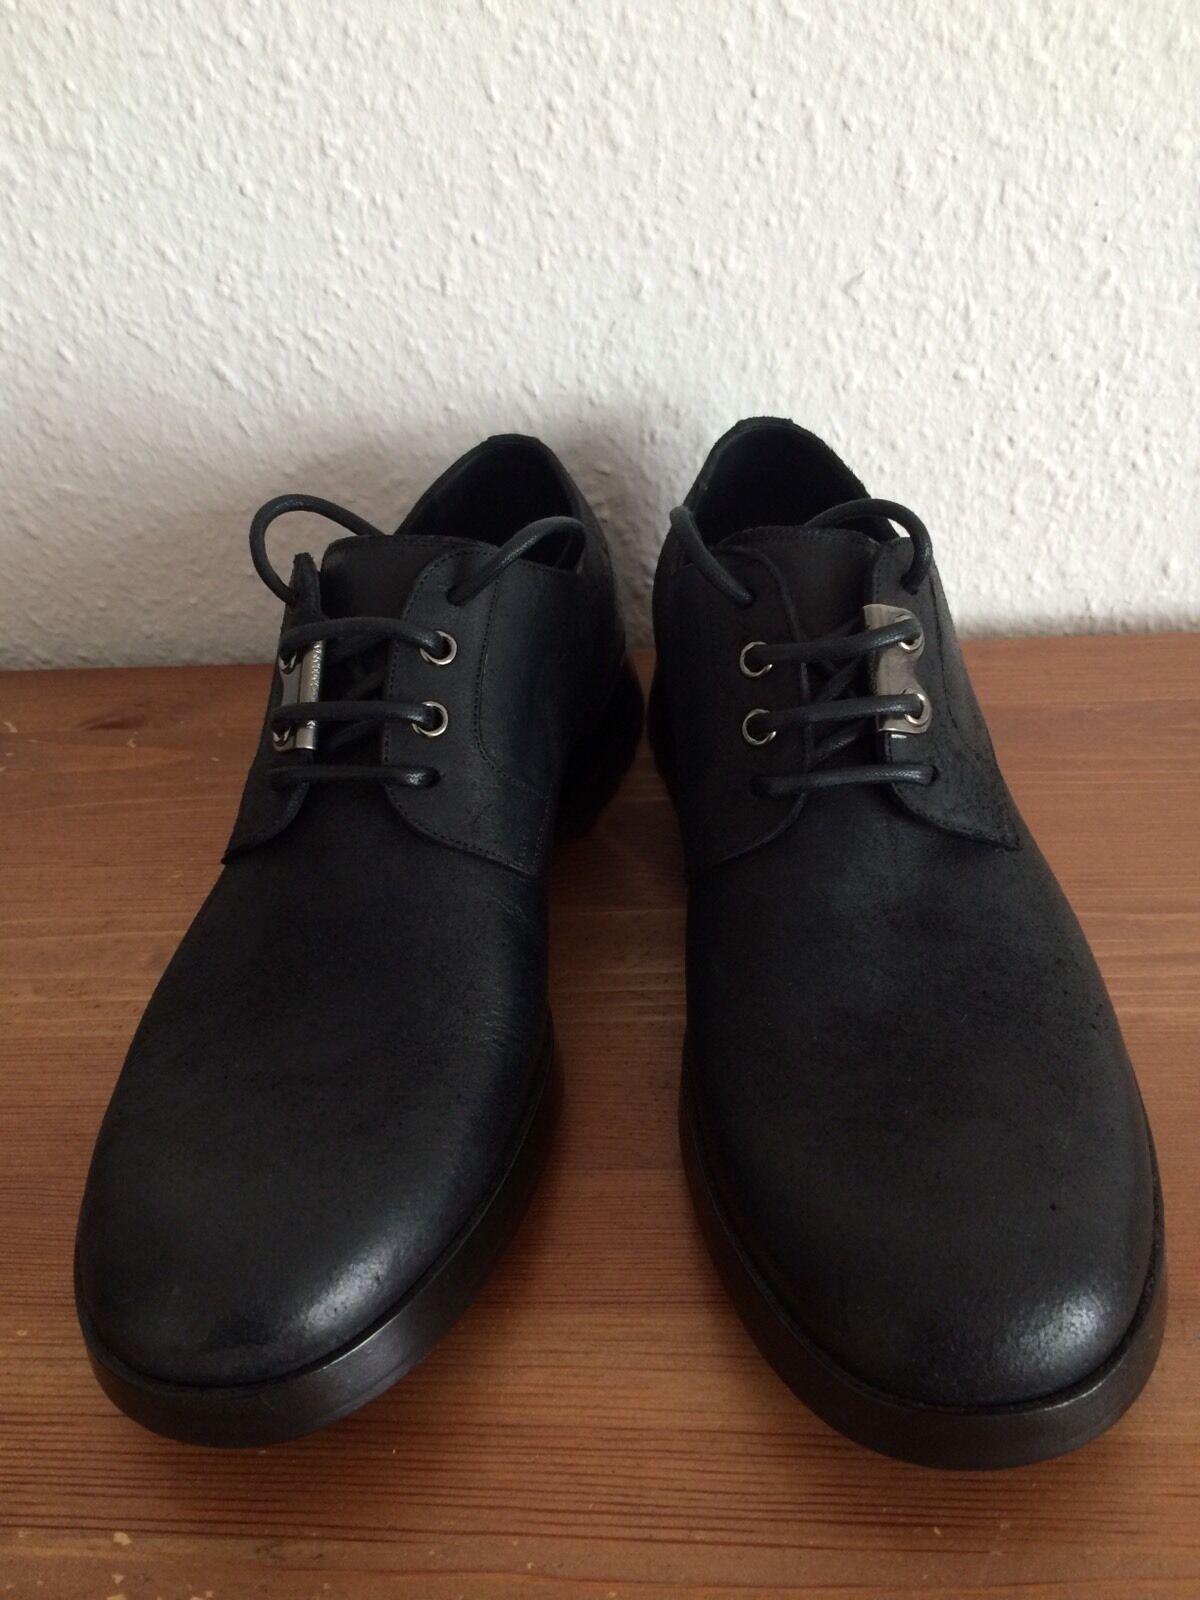 Dolce Gabbana Schwarz Herren Schuhe Größe 41,5 Schwarz Gabbana Neu 034d54